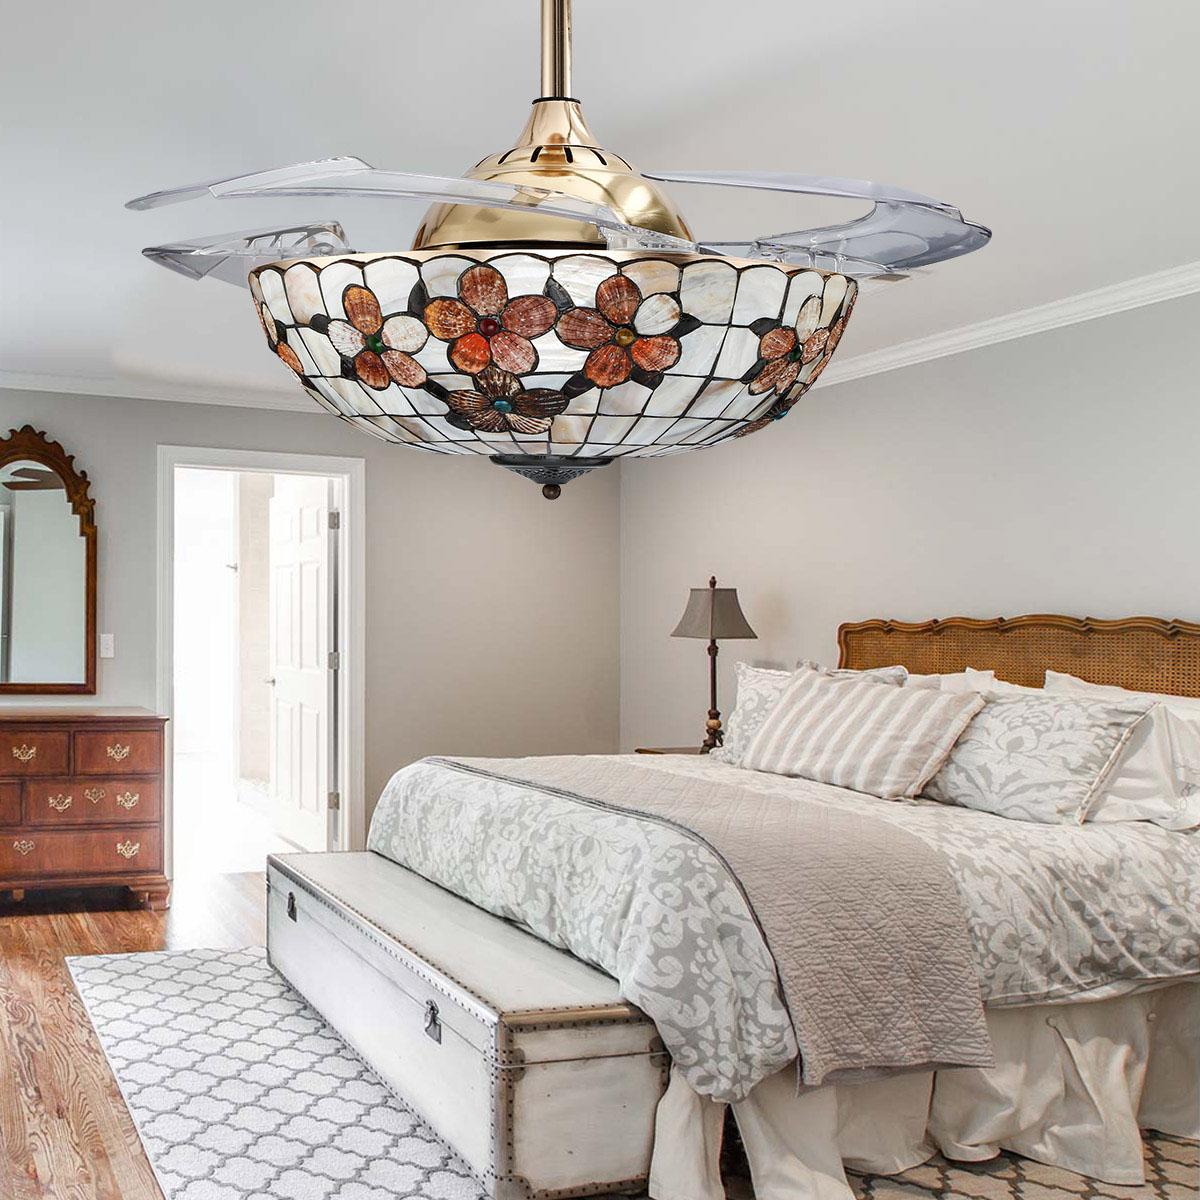 Led Ceiling Fan Light Chandelier Lamp Retractable Blade